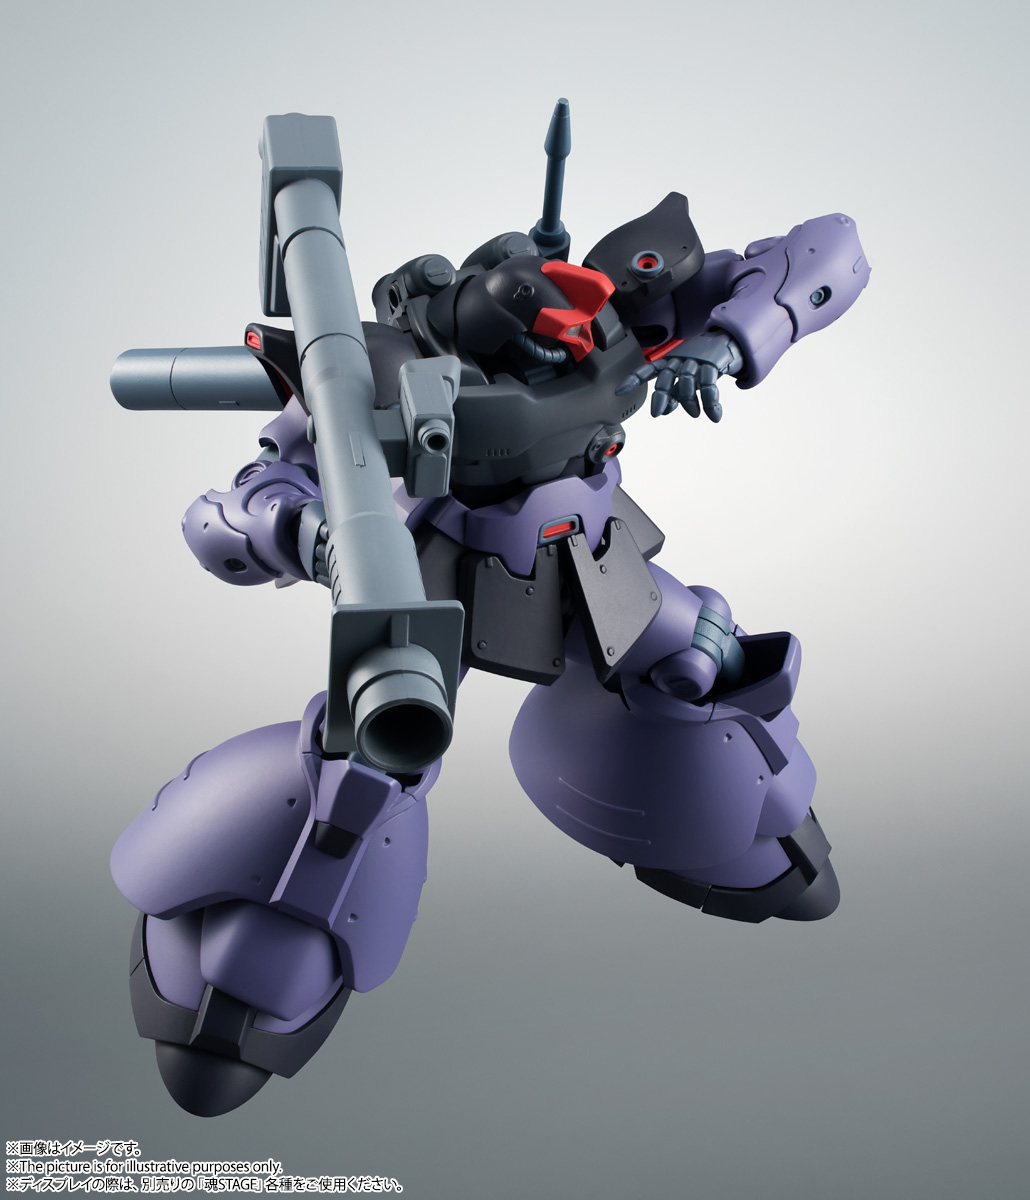 ROBOT魂〈SIDE MS〉『MS-09R-2 リック・ドムⅡ ver. A.N.I.M.E.』機動戦士ガンダム0083 可動フィギュア-009